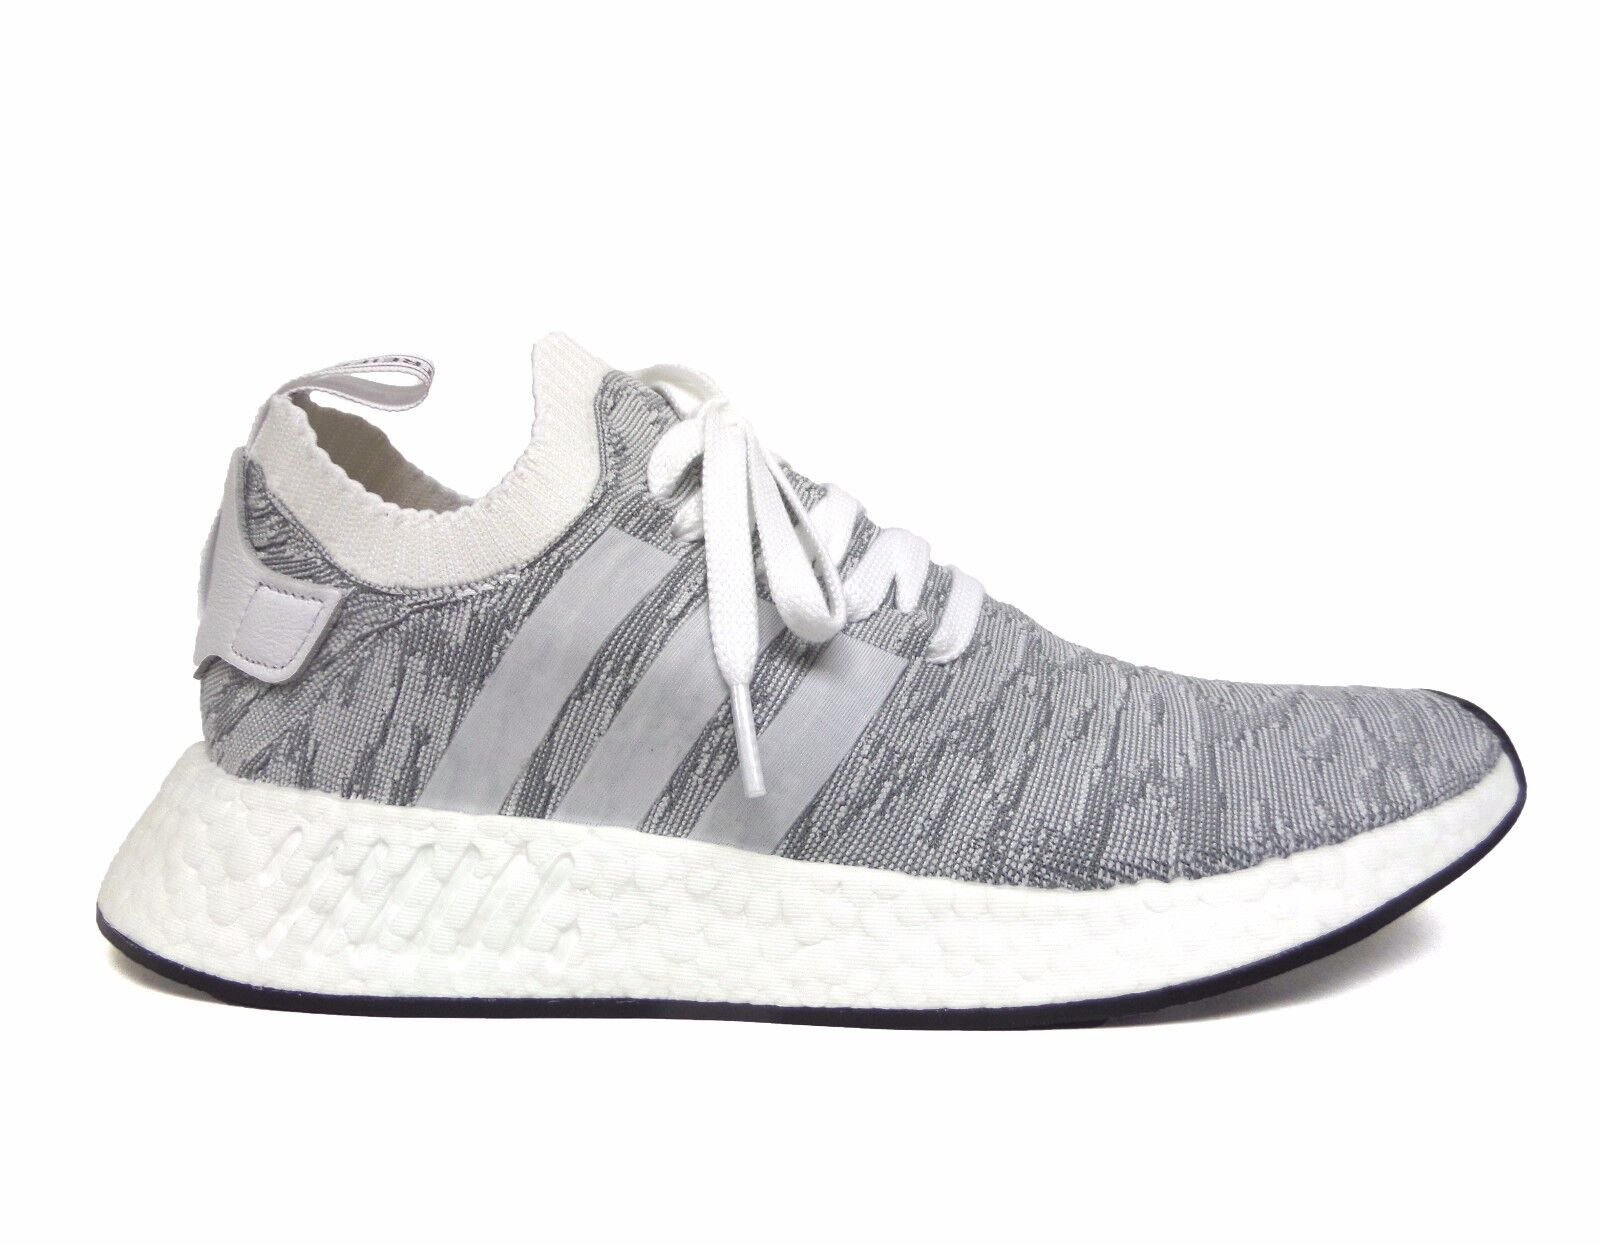 Adidas Men's ORIGINALS NMD R2 PRIMEKNIT Running Shoes White/Black BY9410 b